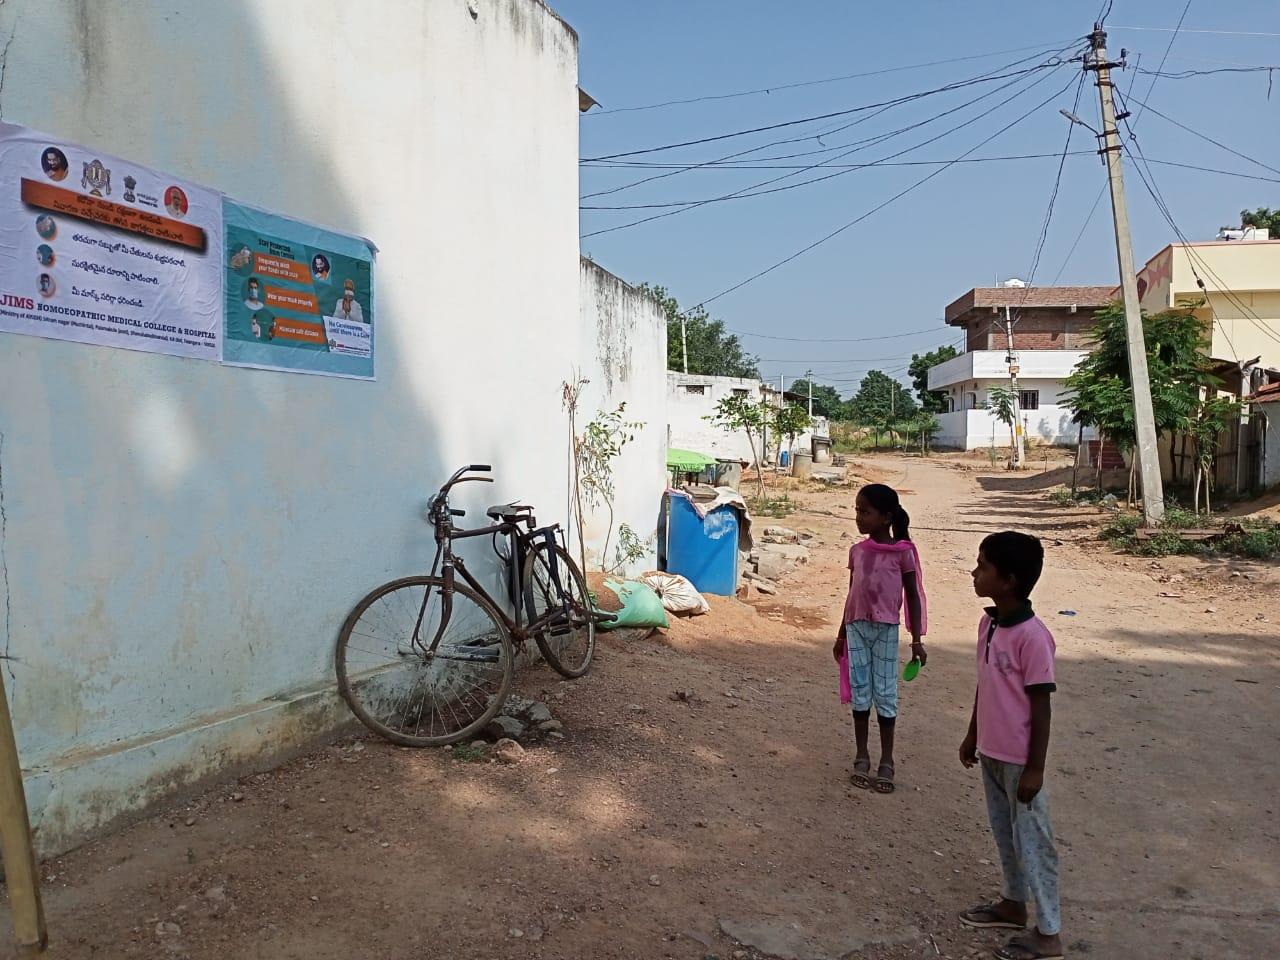 Janandolan campaign on COVID 19 – IEC Poster sticking at Manchan padu village. This is another hamlet village of Modallaguda panchayath